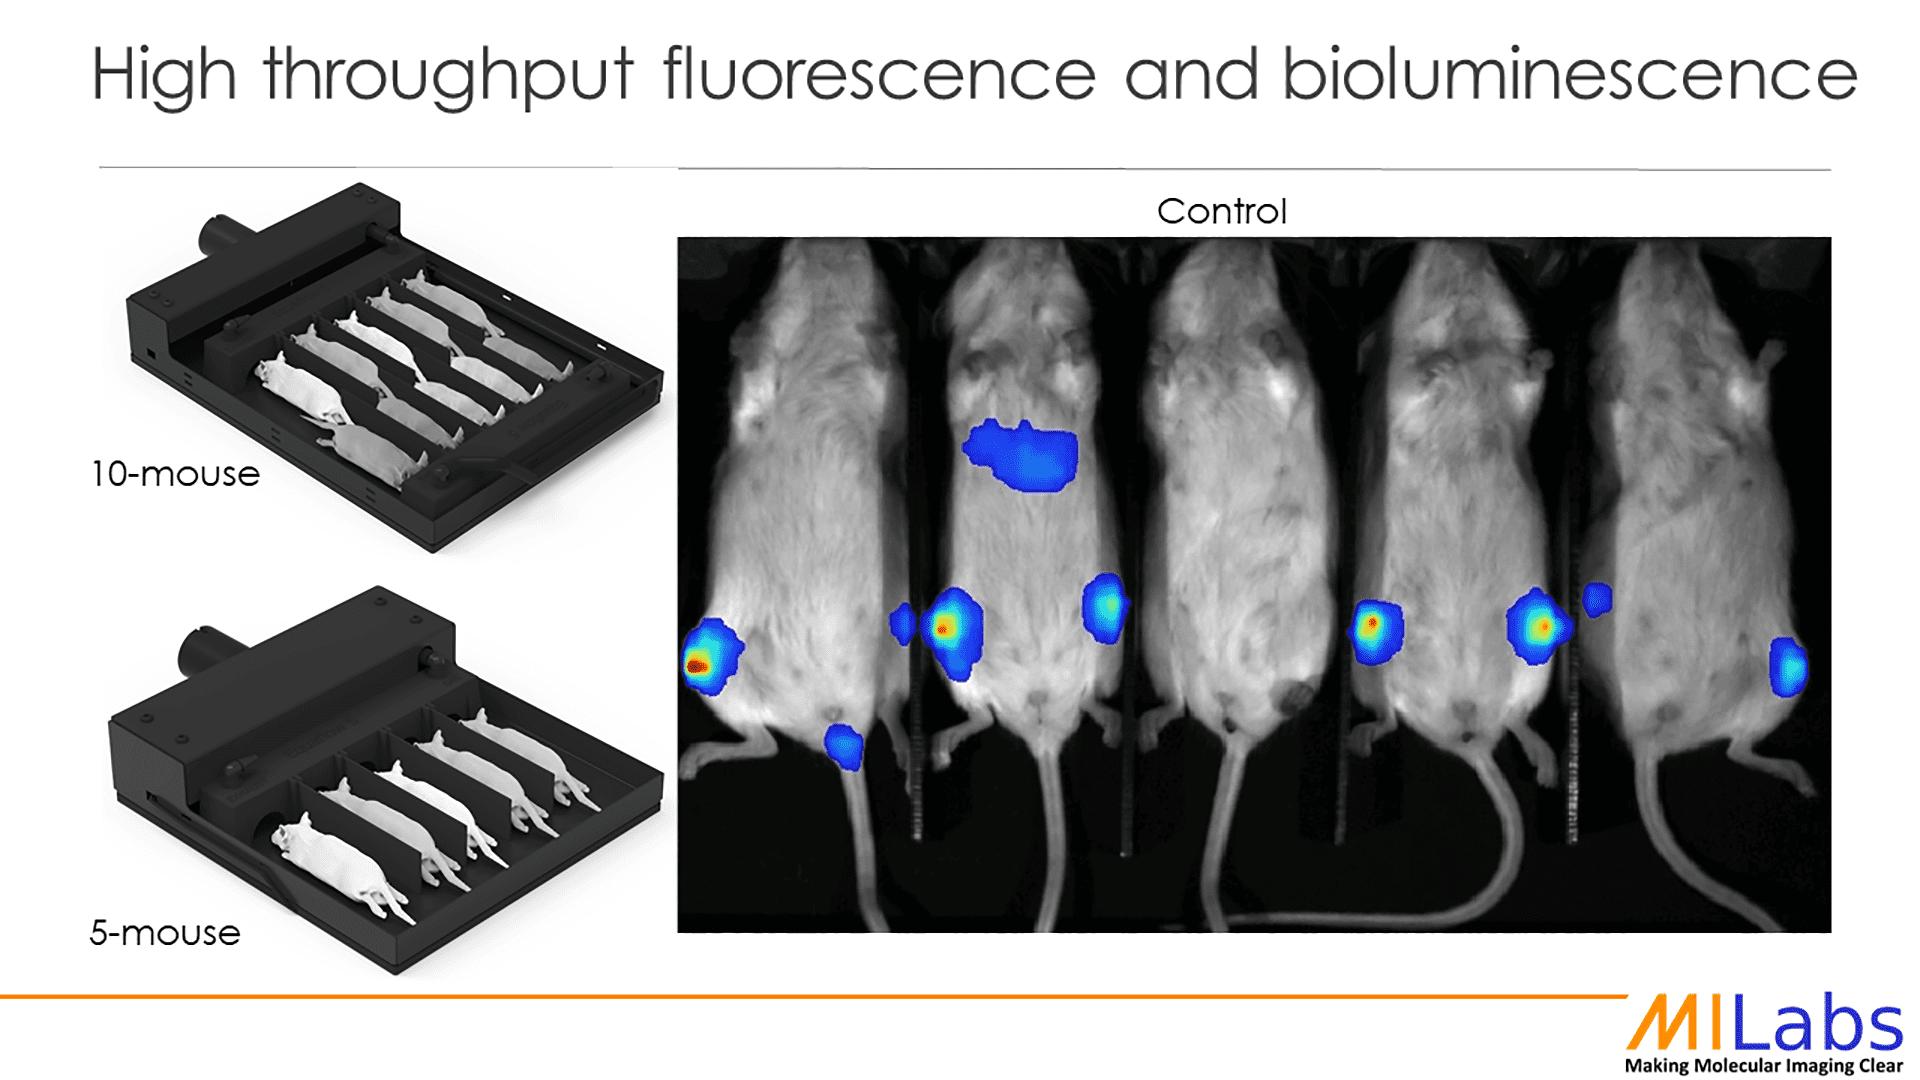 high throughput fluorescence and bioluminescence